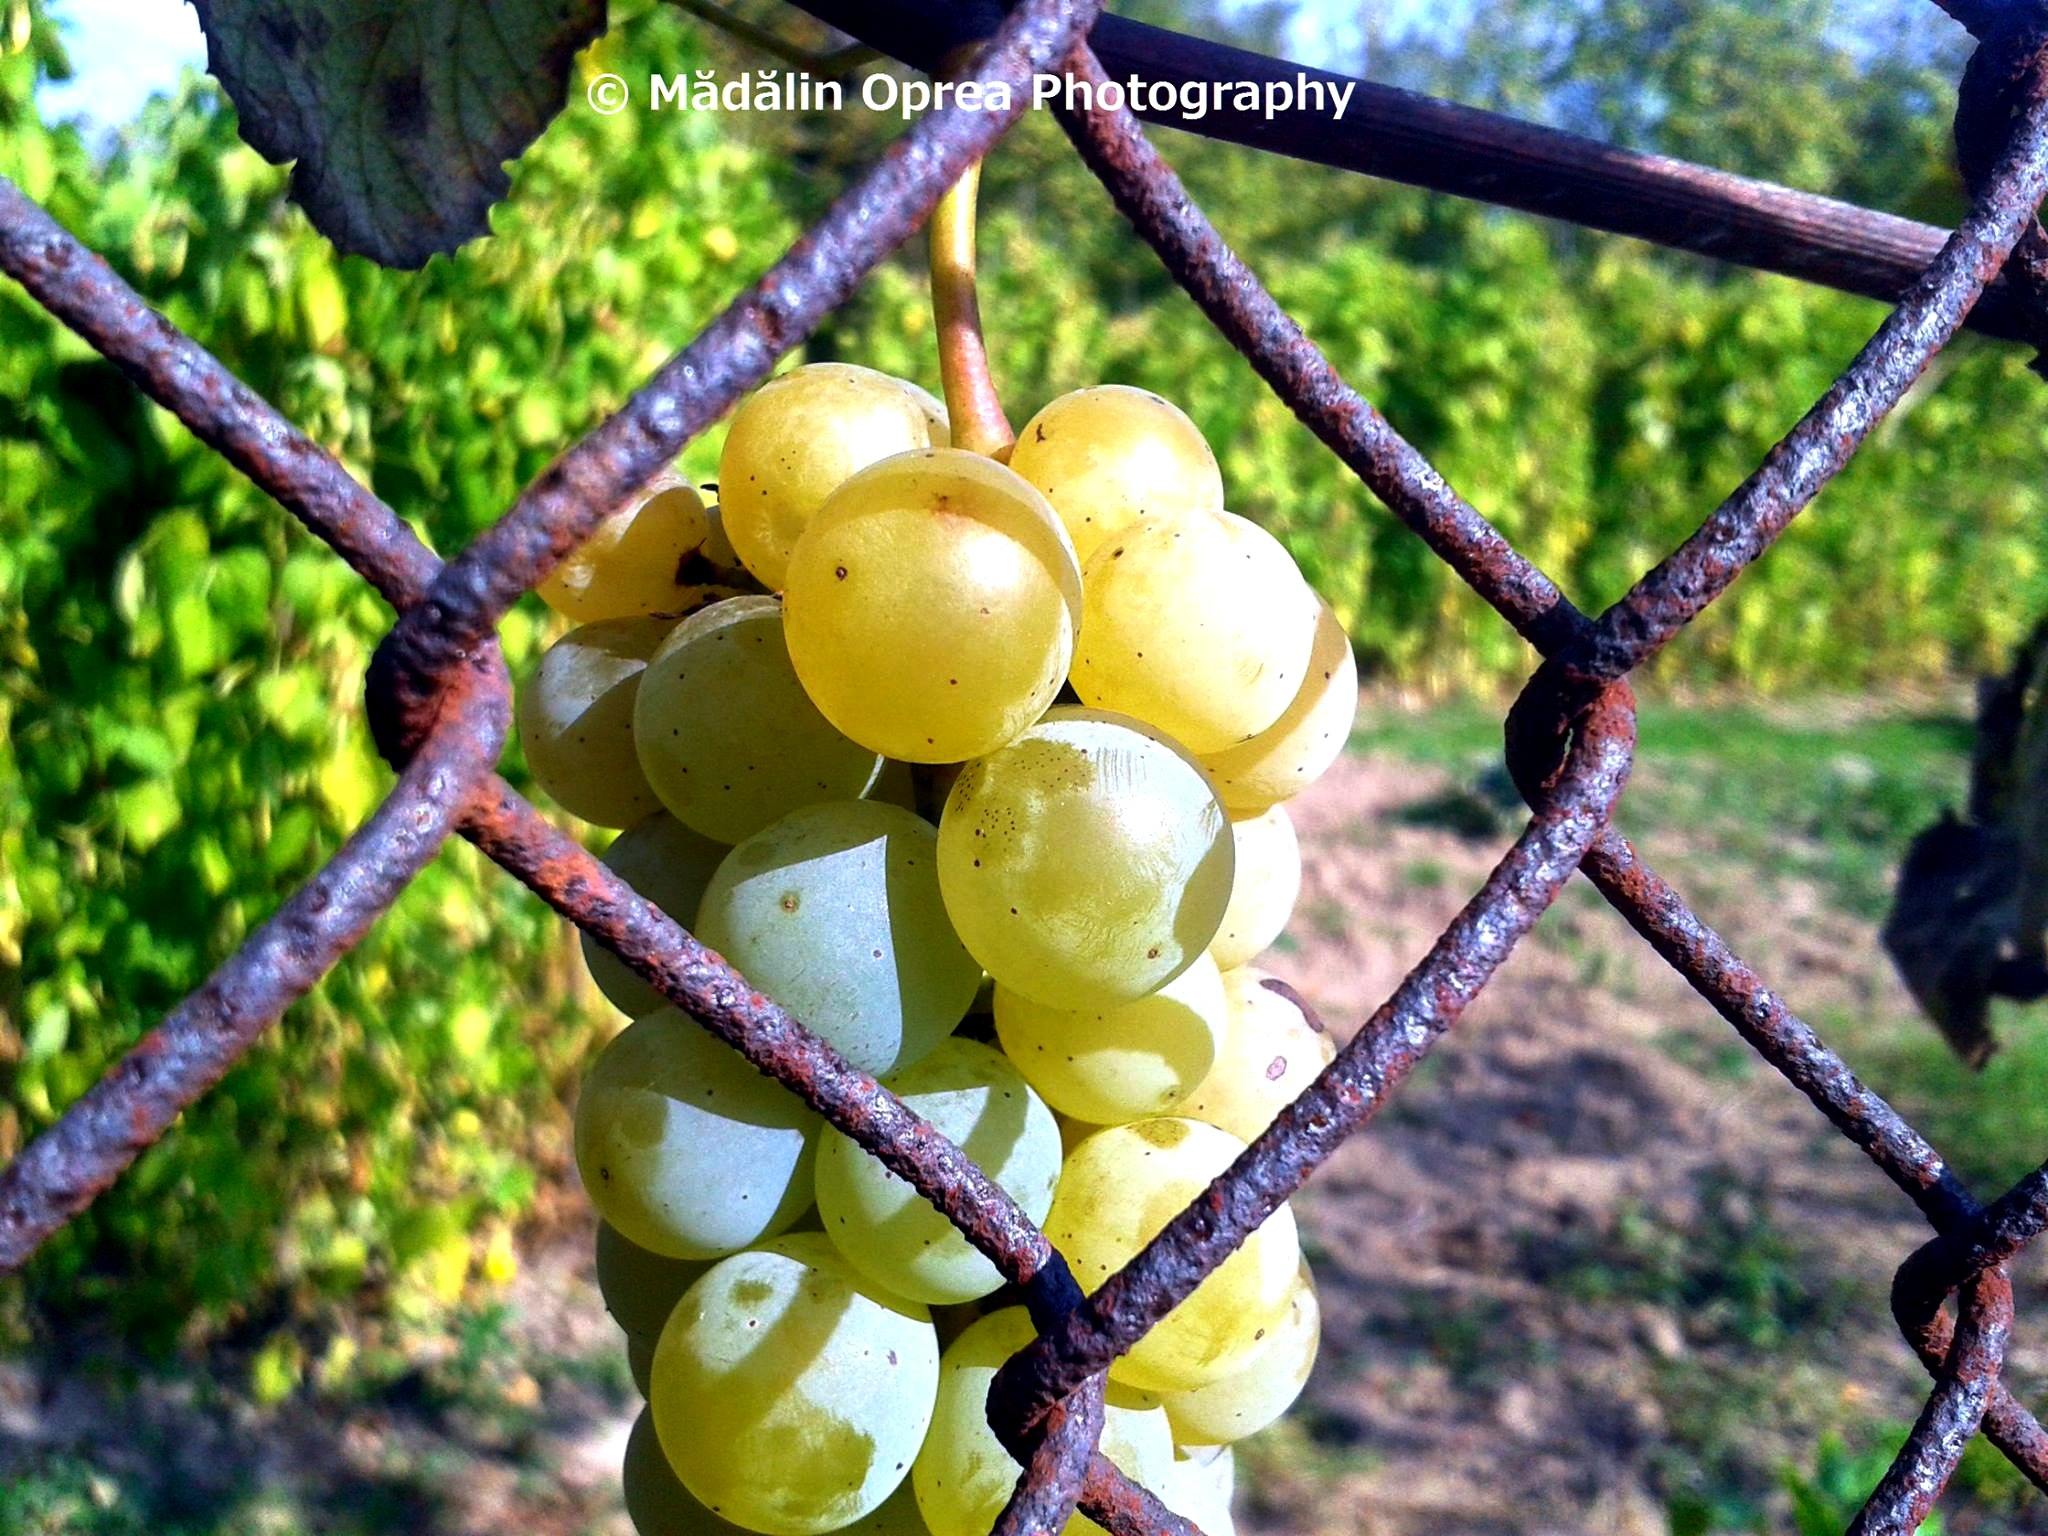 Grapes by Mădălin Oprea Photography